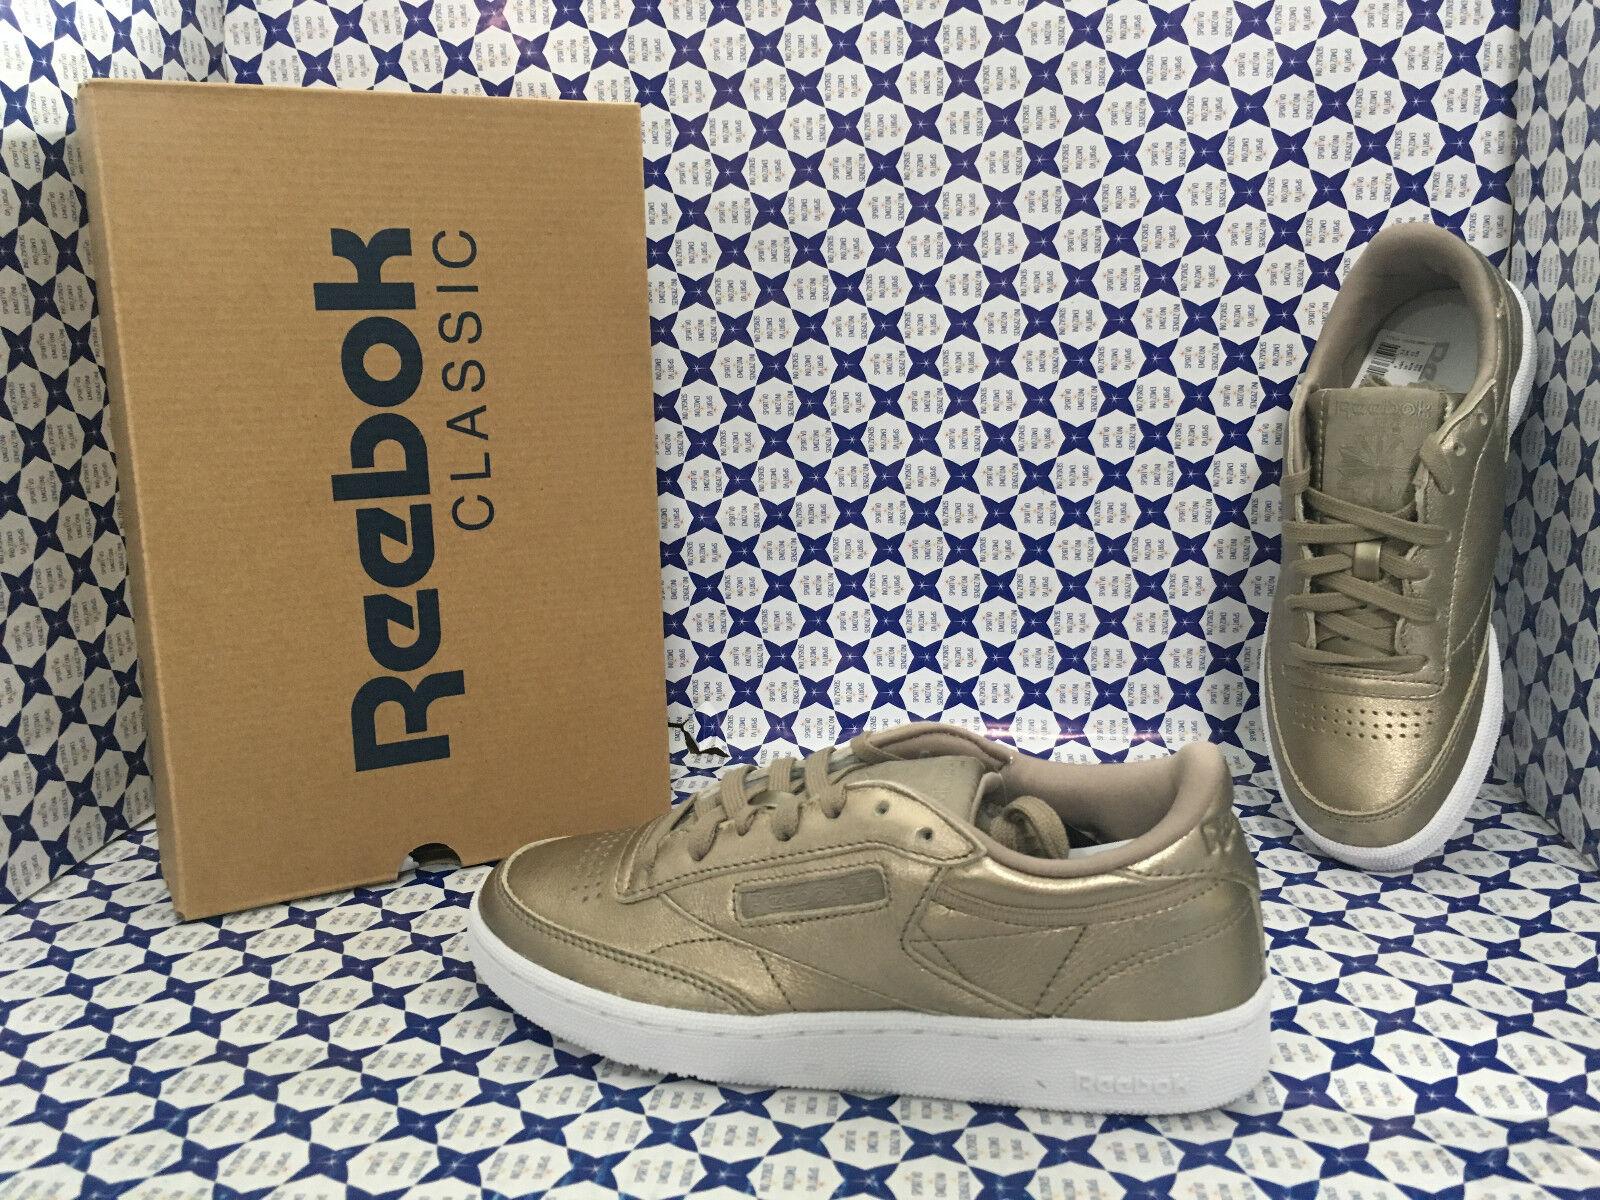 shoes Reebok women - Club C 85 - gold - BS7901